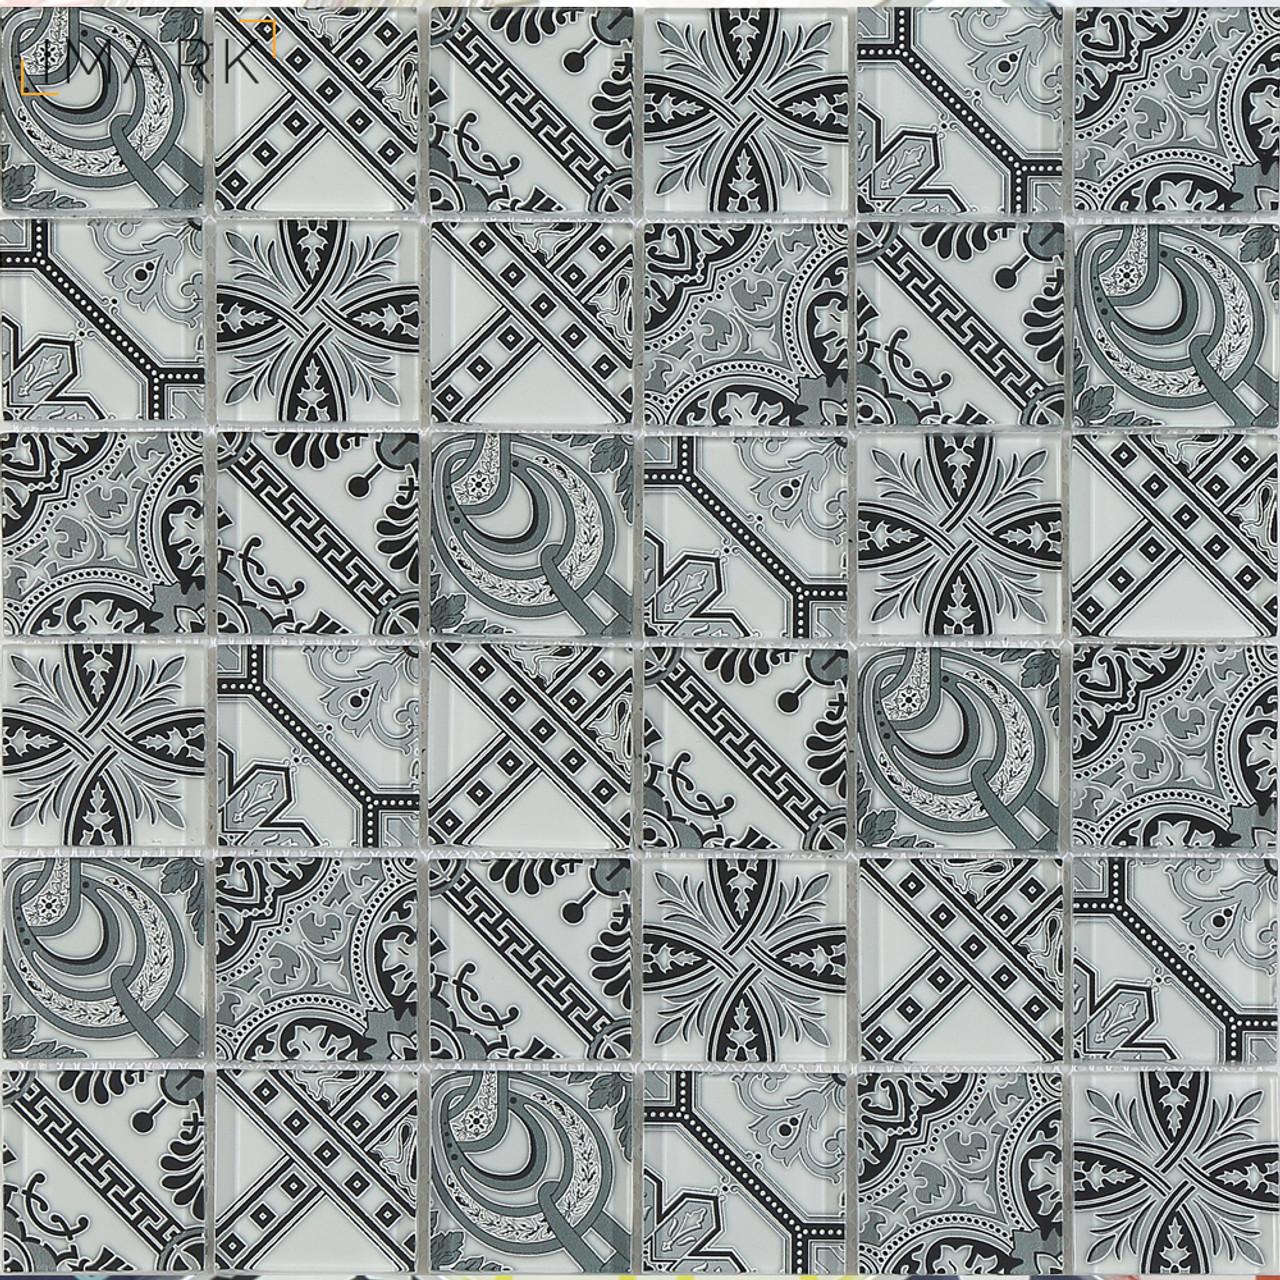 Arabesque Pattern Design Digital Print Glass Mosaic Tile Backsplash ...